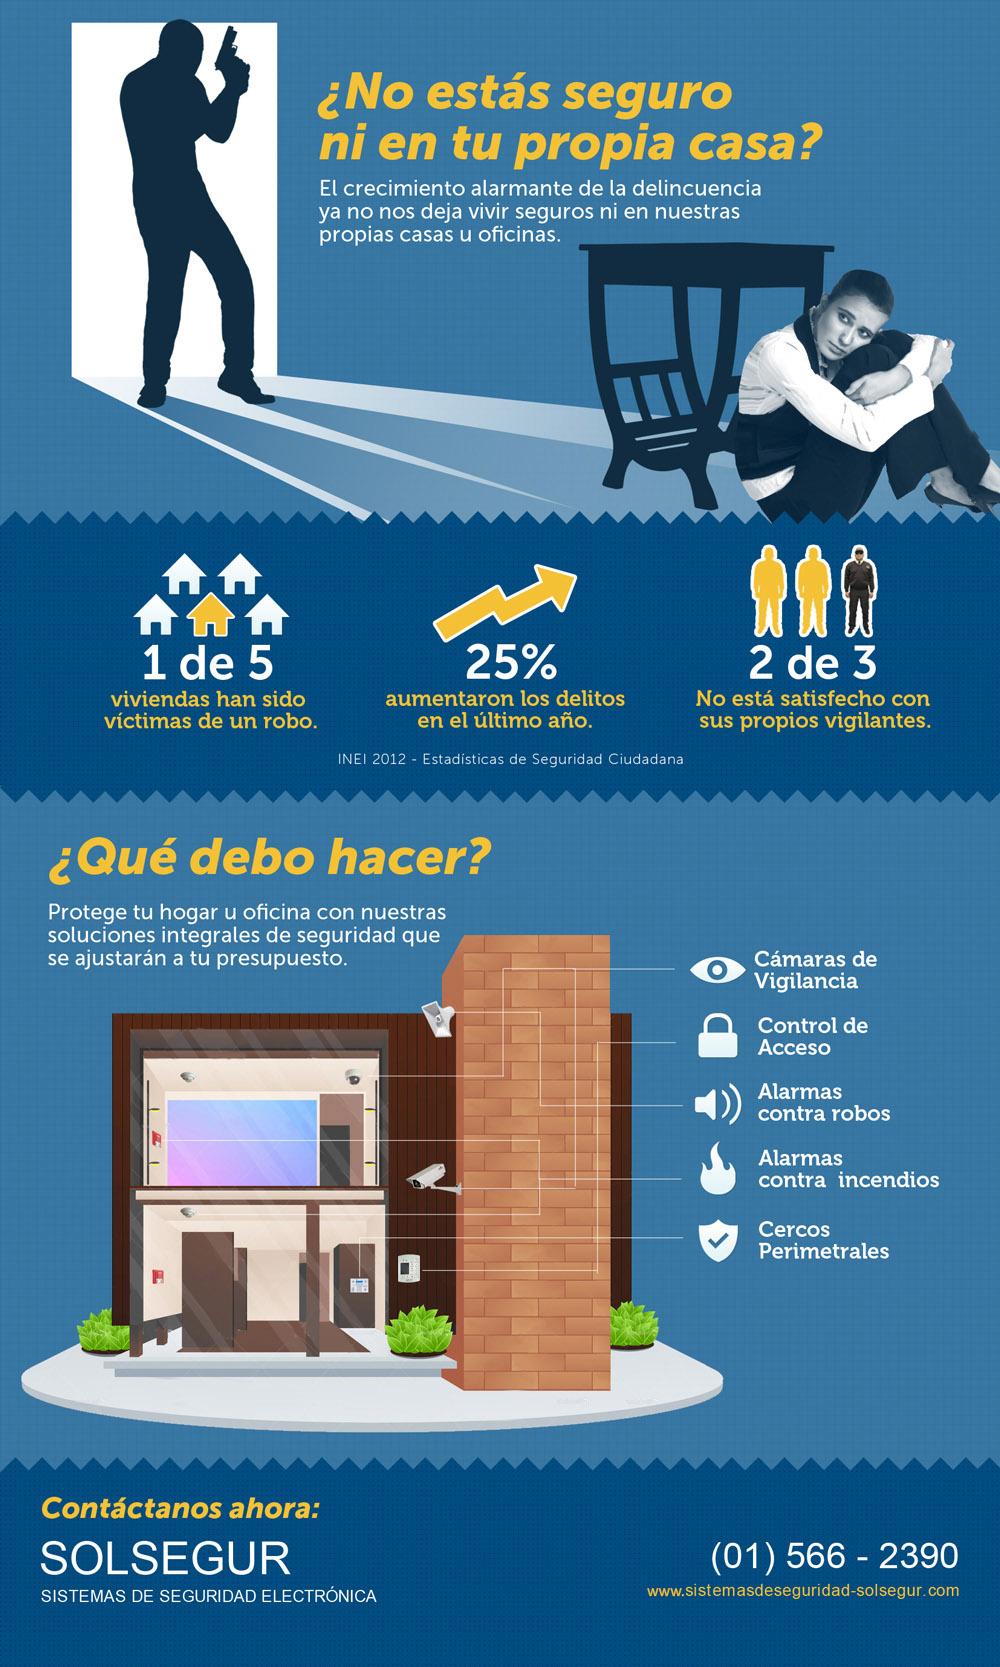 Sistemas de seguridad electr nica infografia infographic - Sistemas de seguridad ...